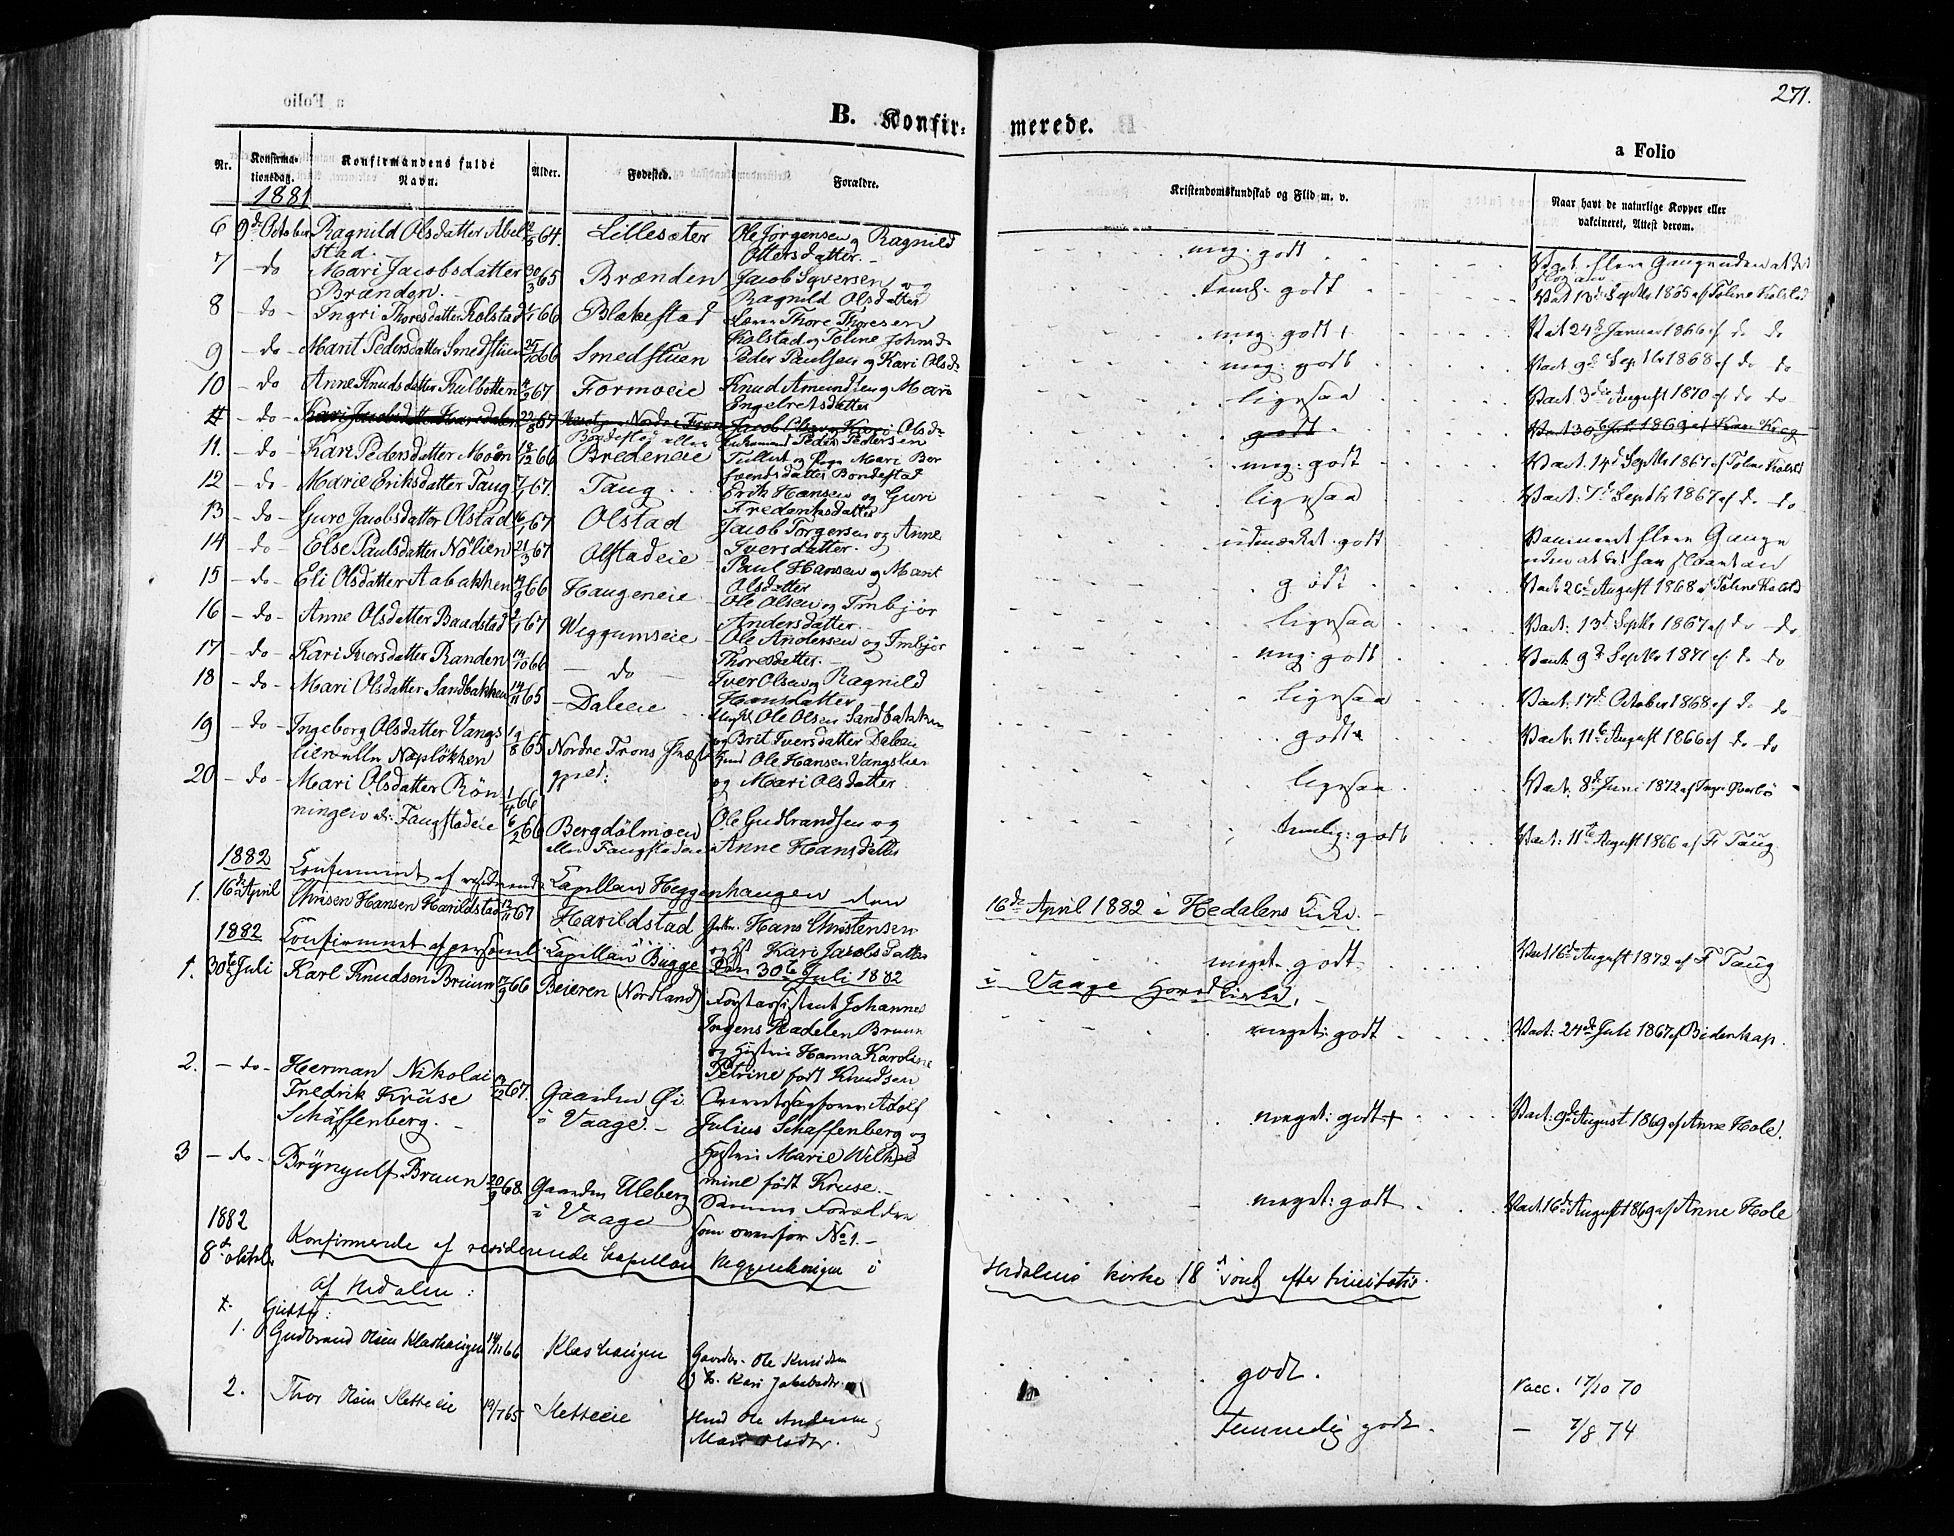 SAH, Vågå prestekontor, Ministerialbok nr. 7 /1, 1872-1886, s. 271